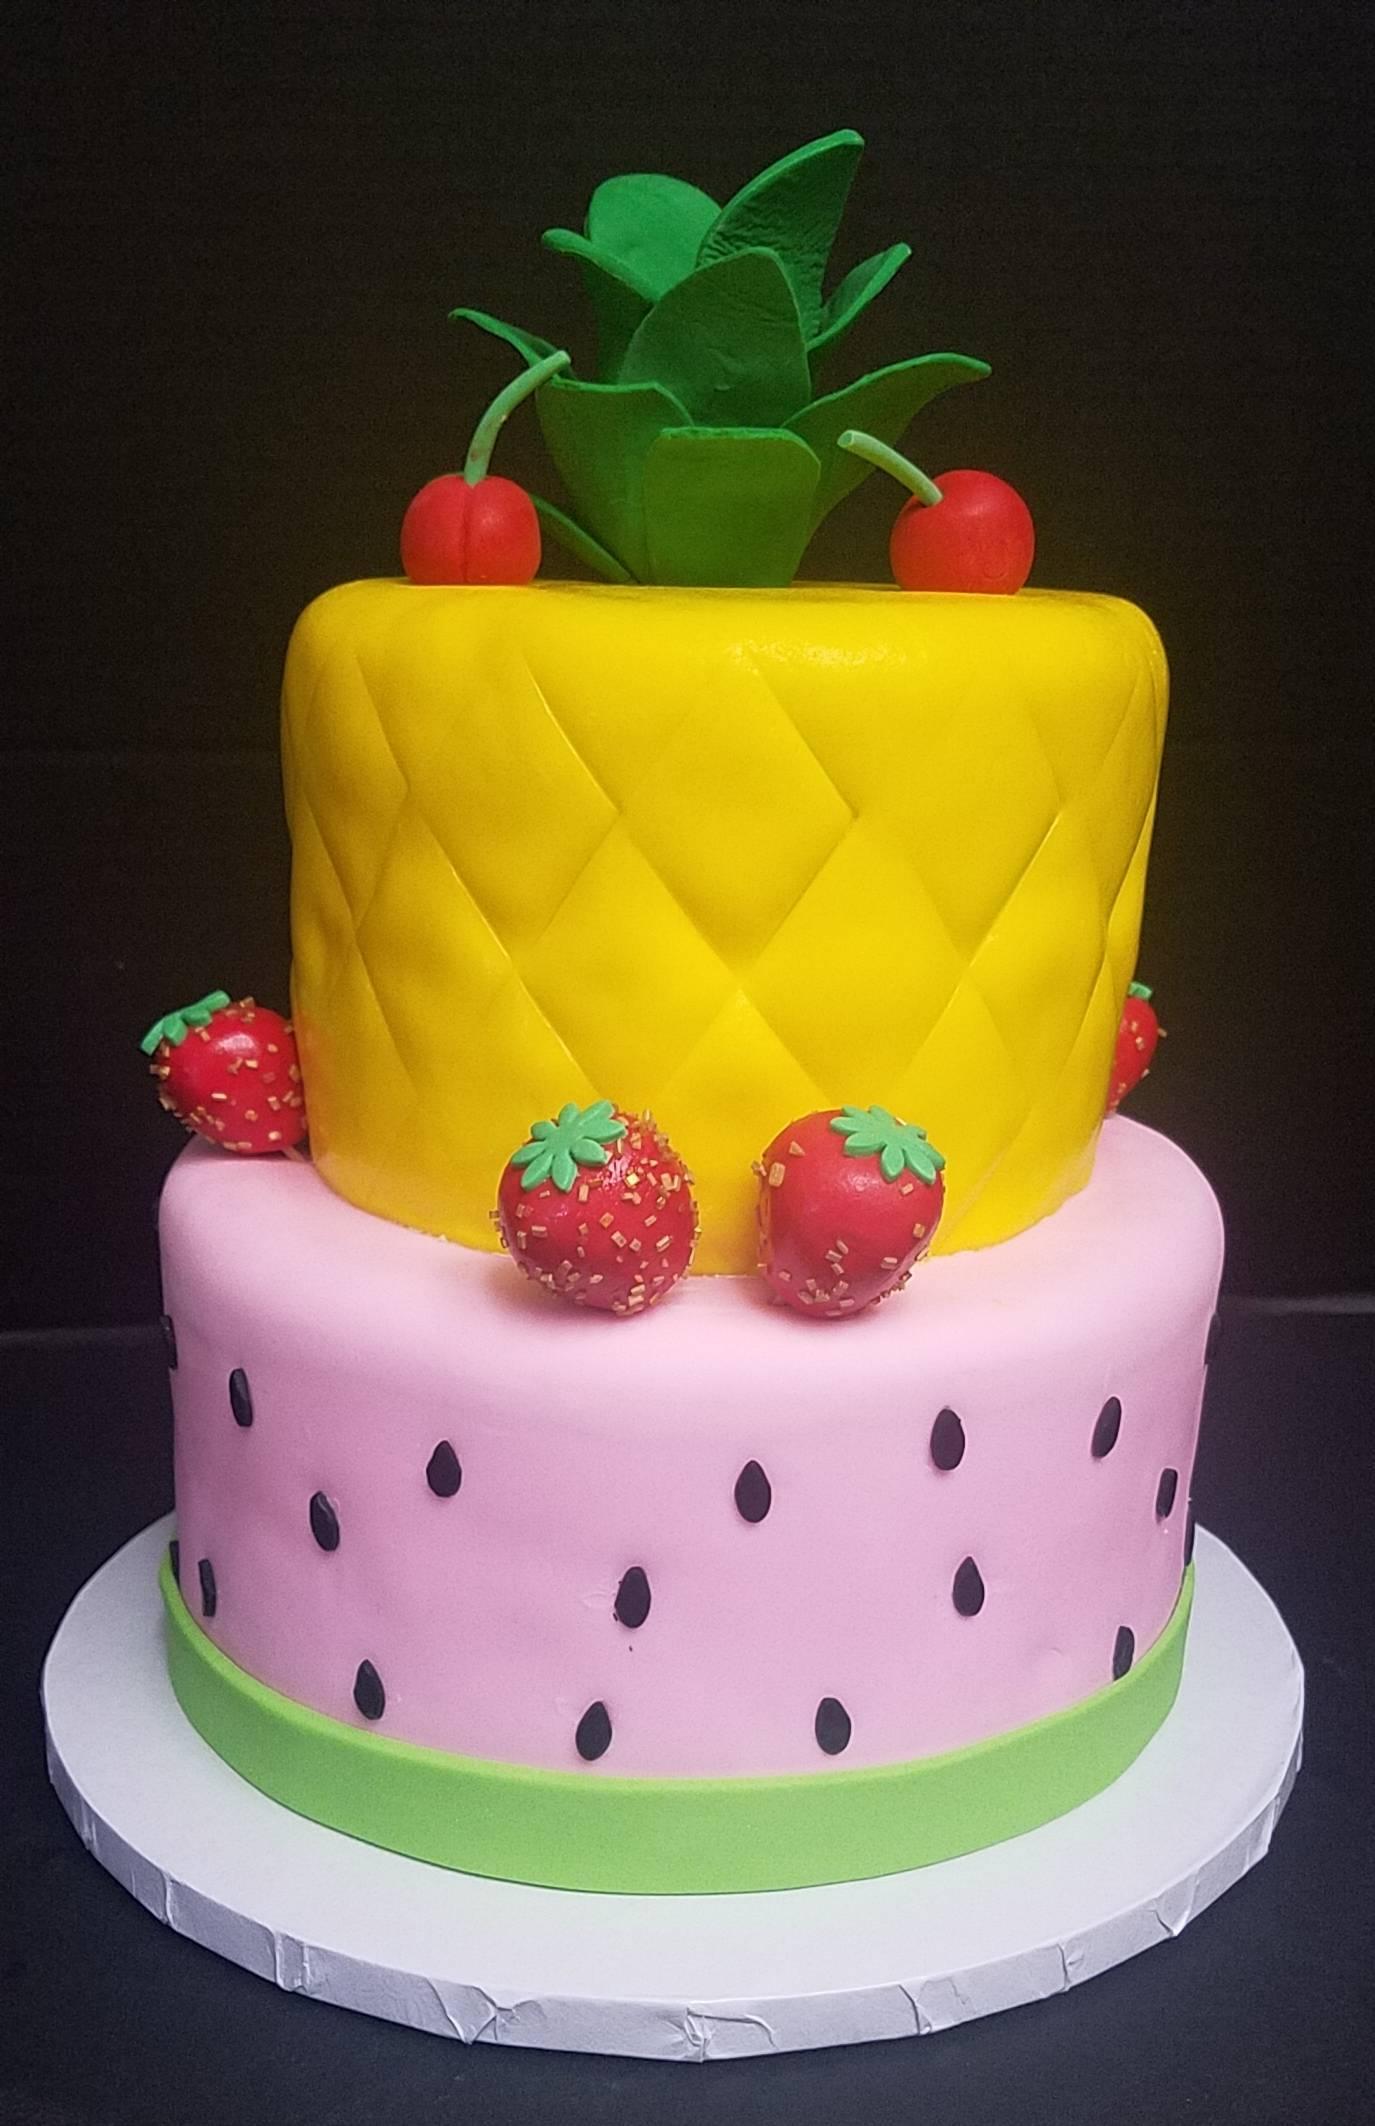 Pineapple/Watermelon Cake